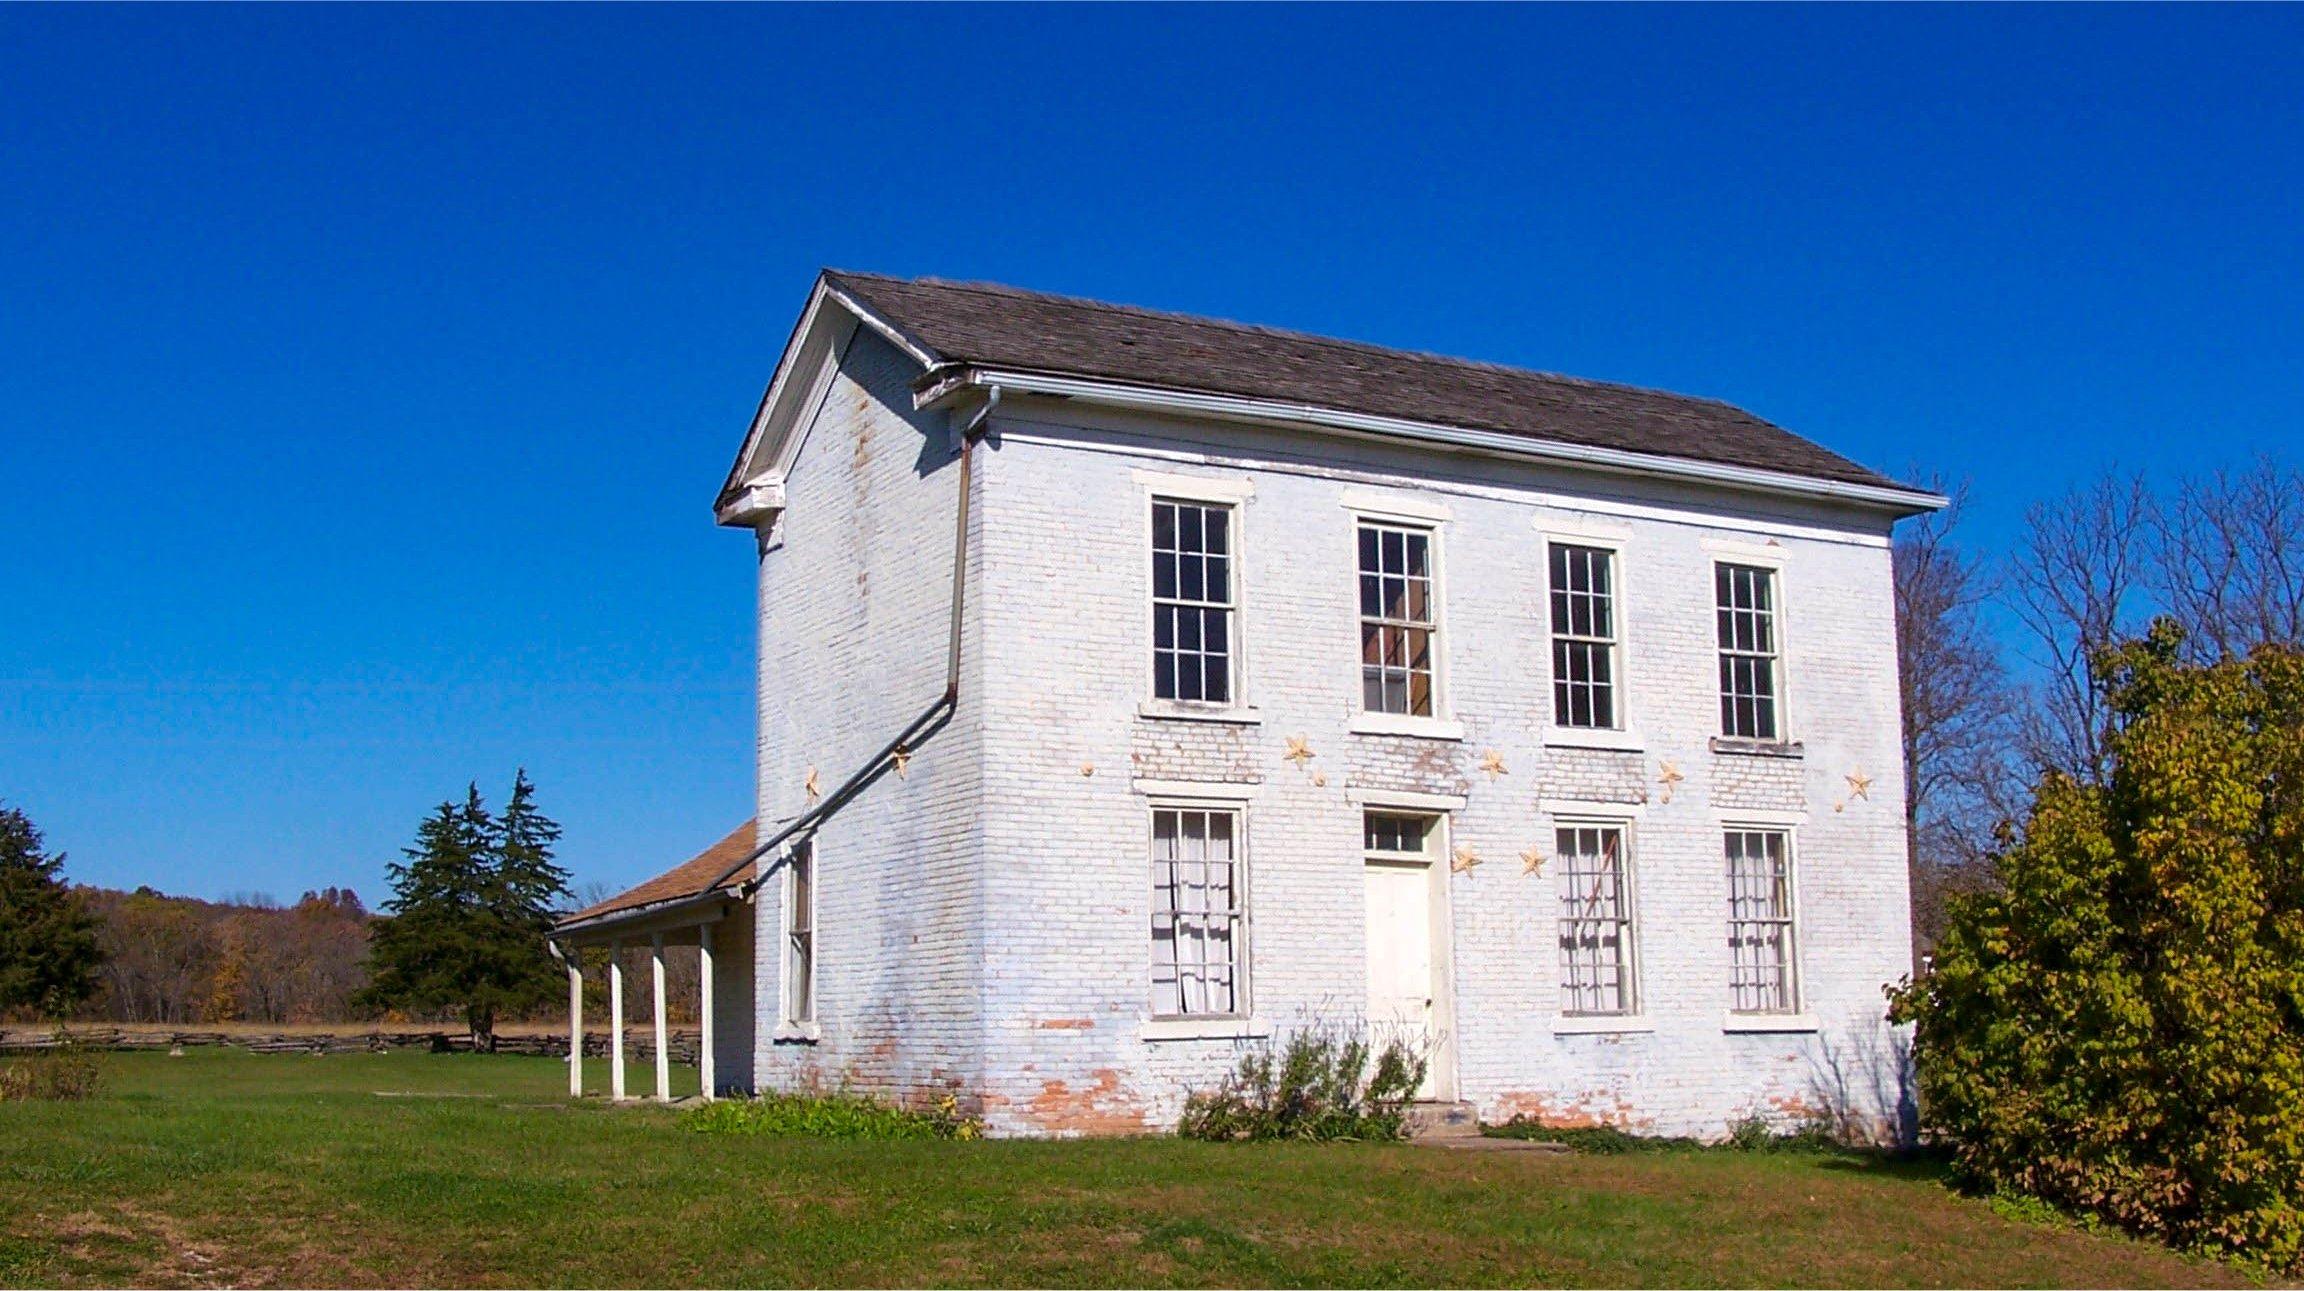 Battle of Athens State Historic Site Revere, Missouri